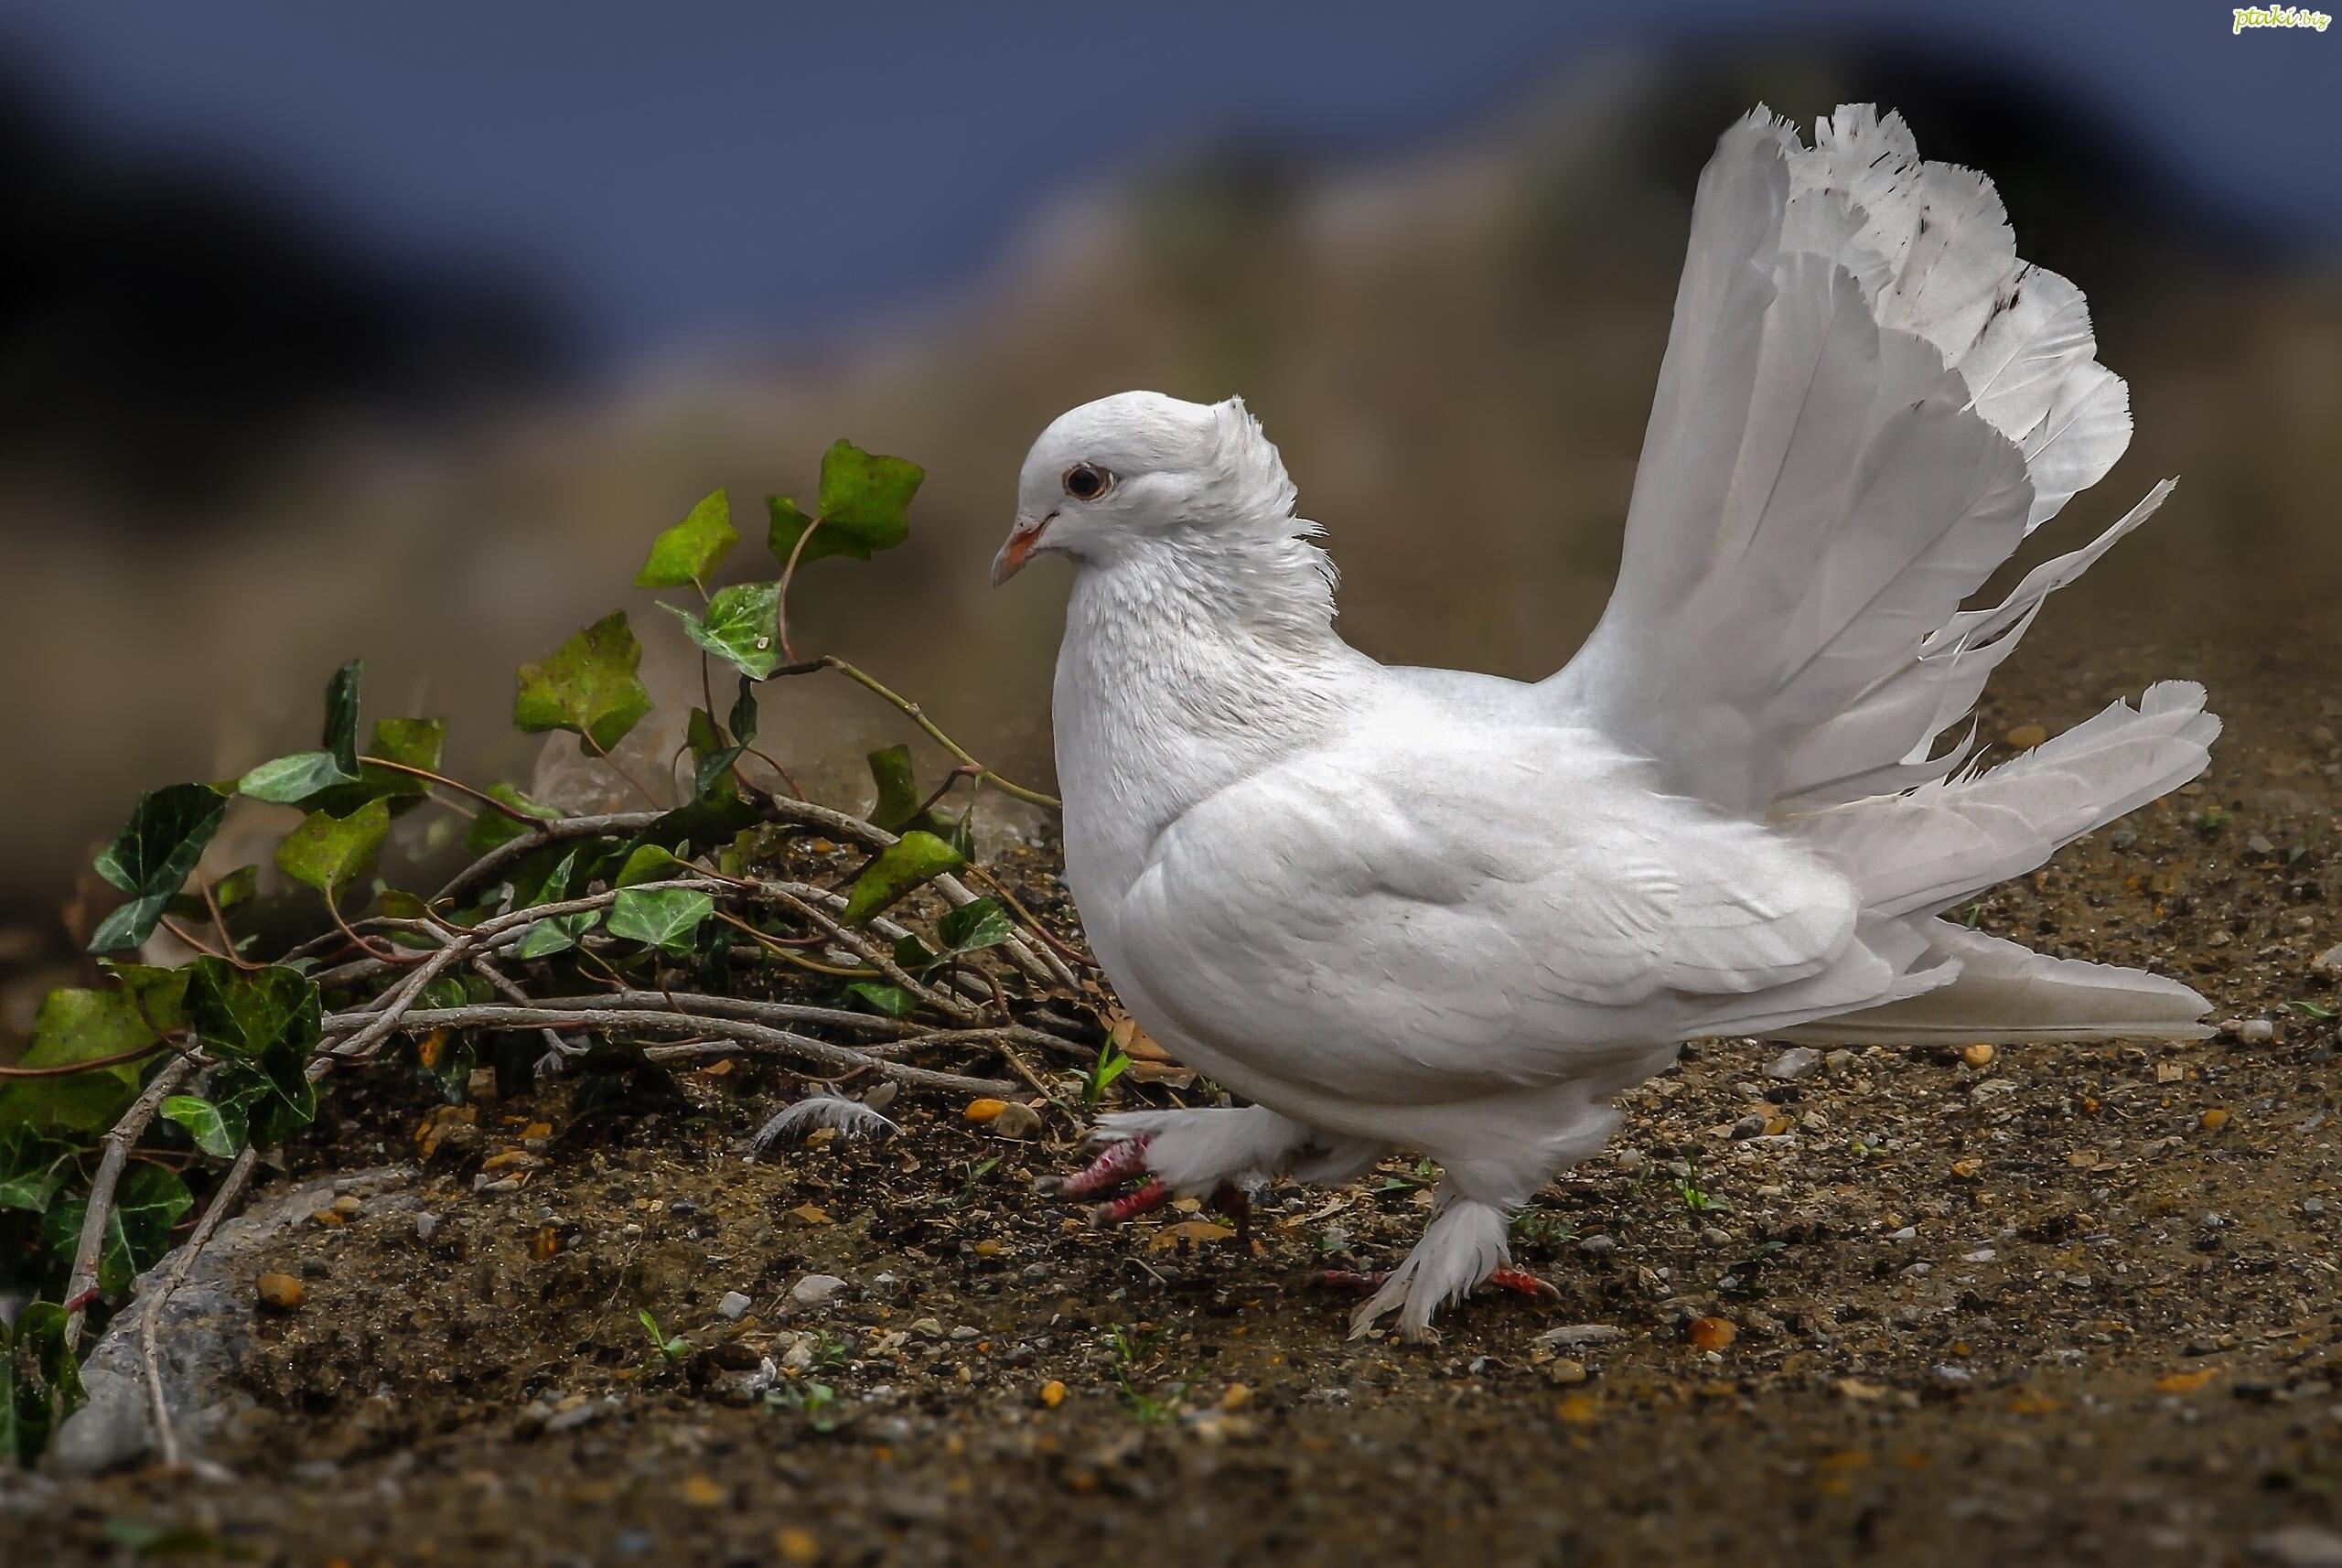 pigeon wallpaper hd